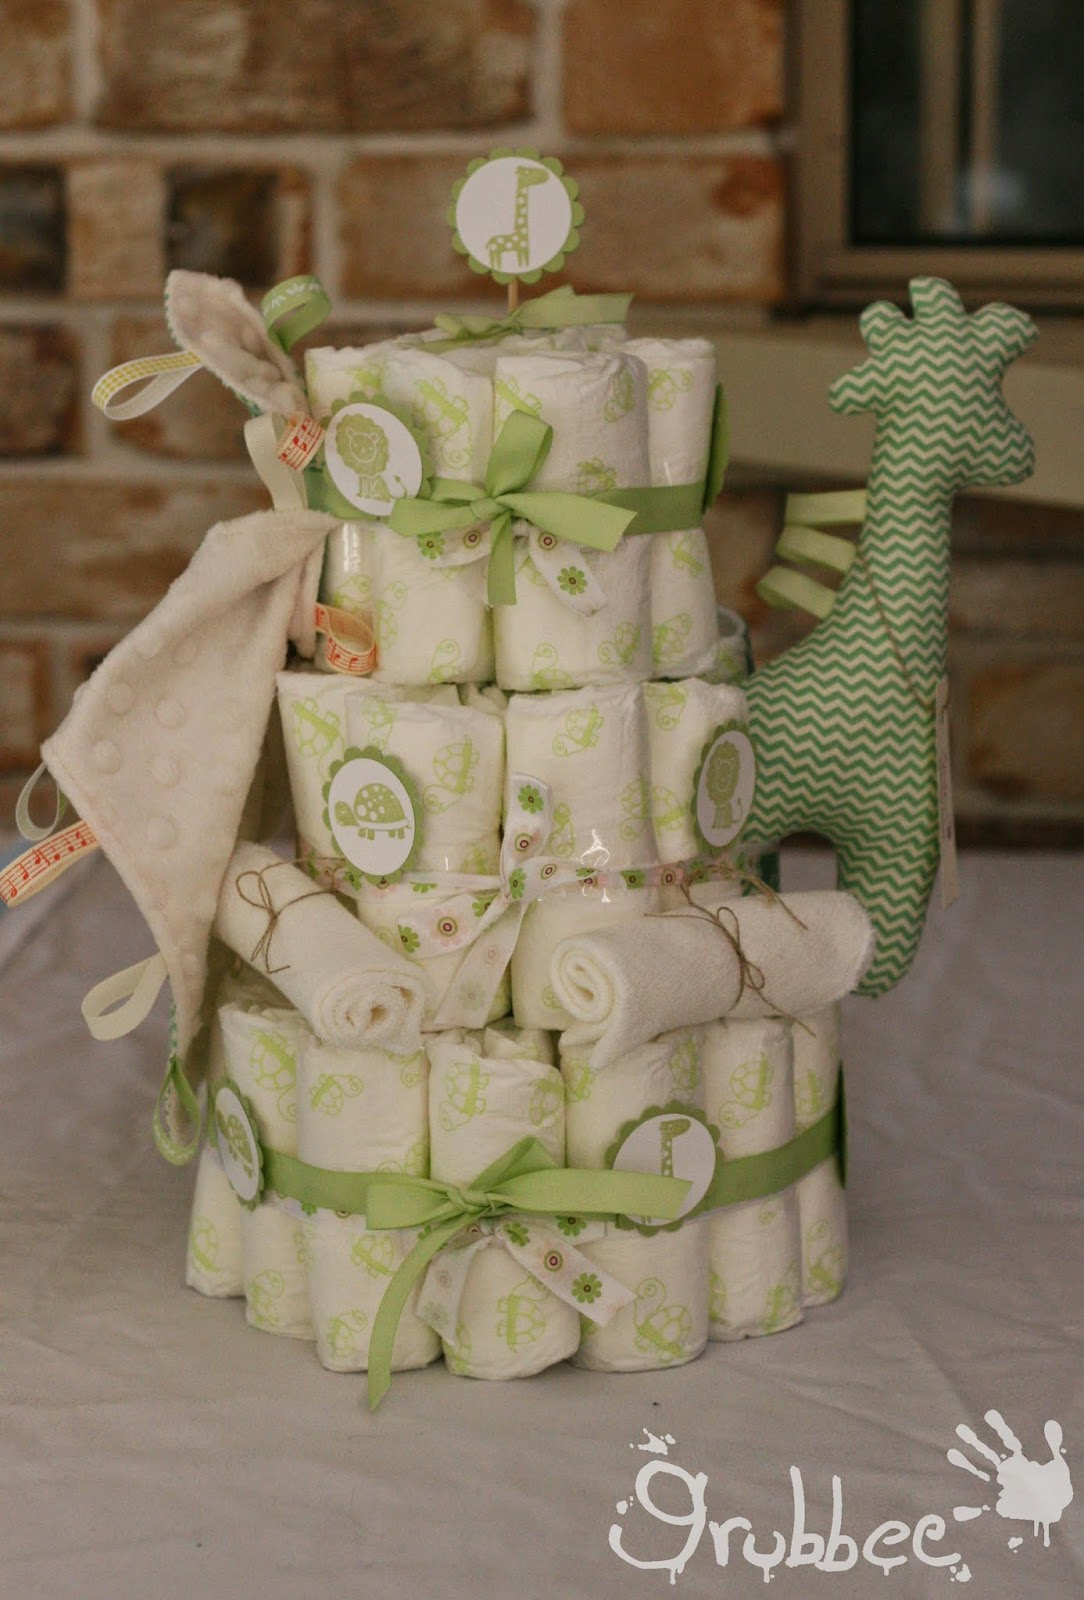 nappy cake grubbee